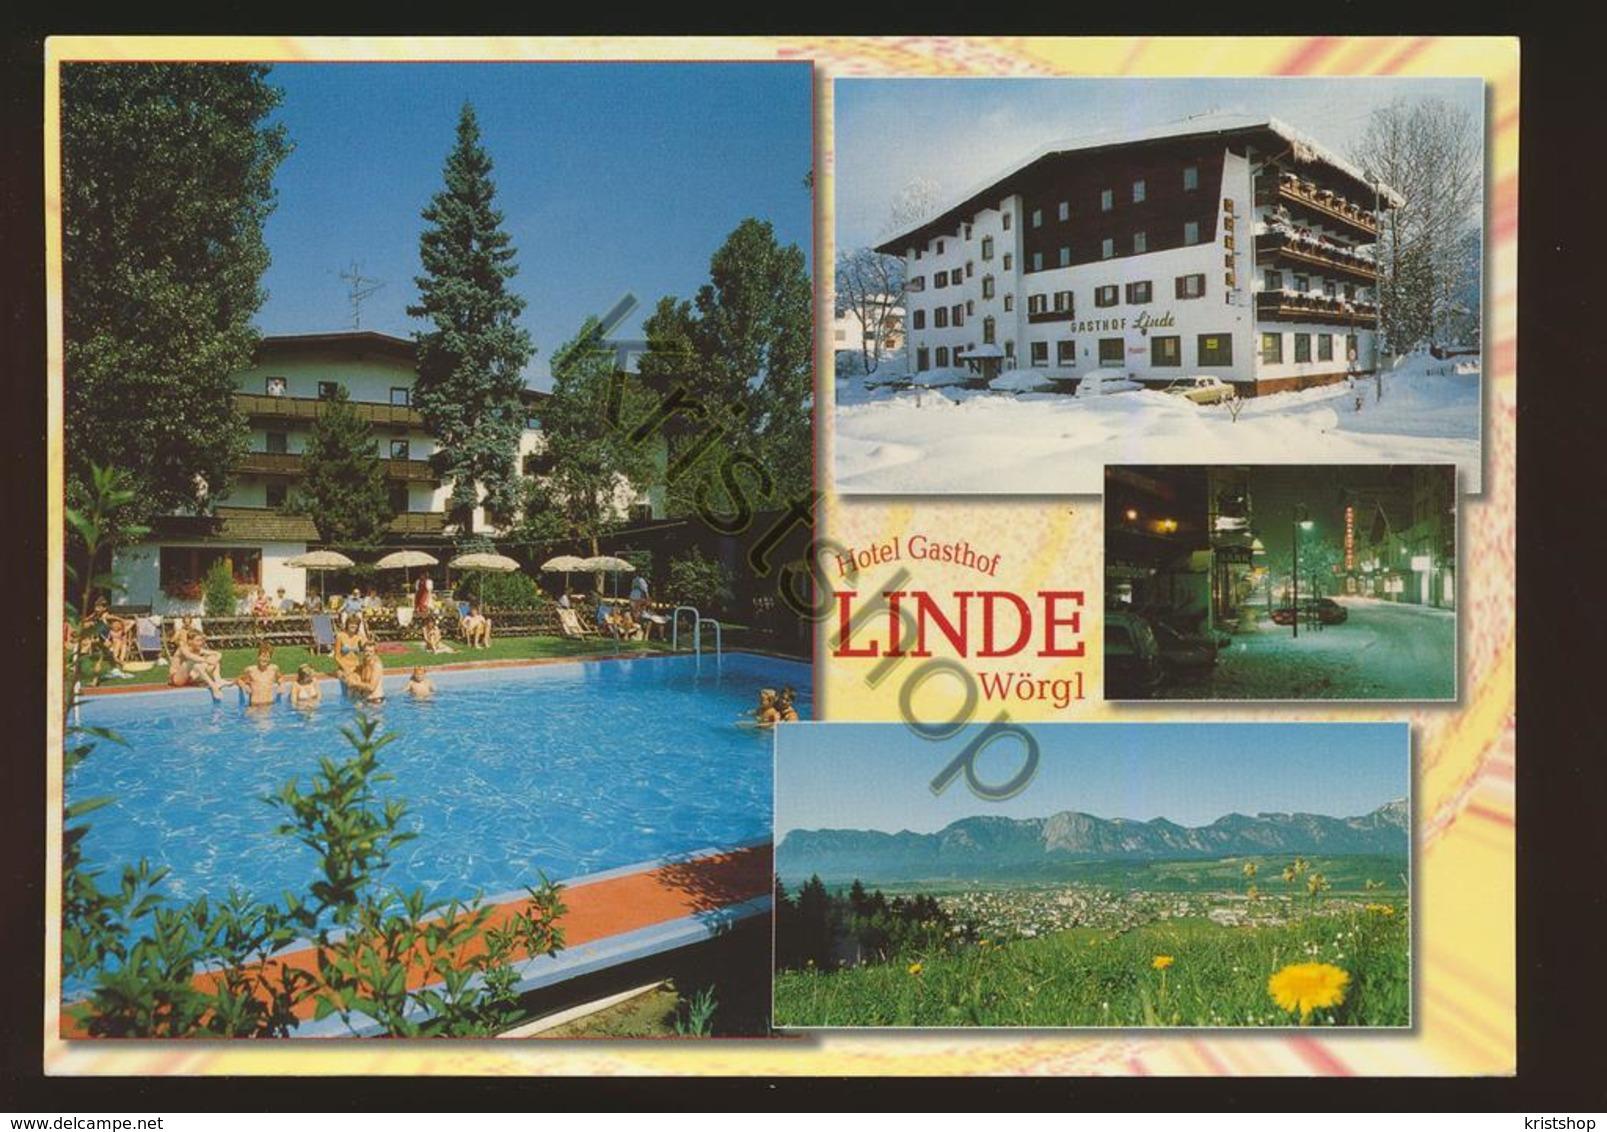 Wörgl - Hotel Gasthof Linde [AA41-1.816 - Autriche